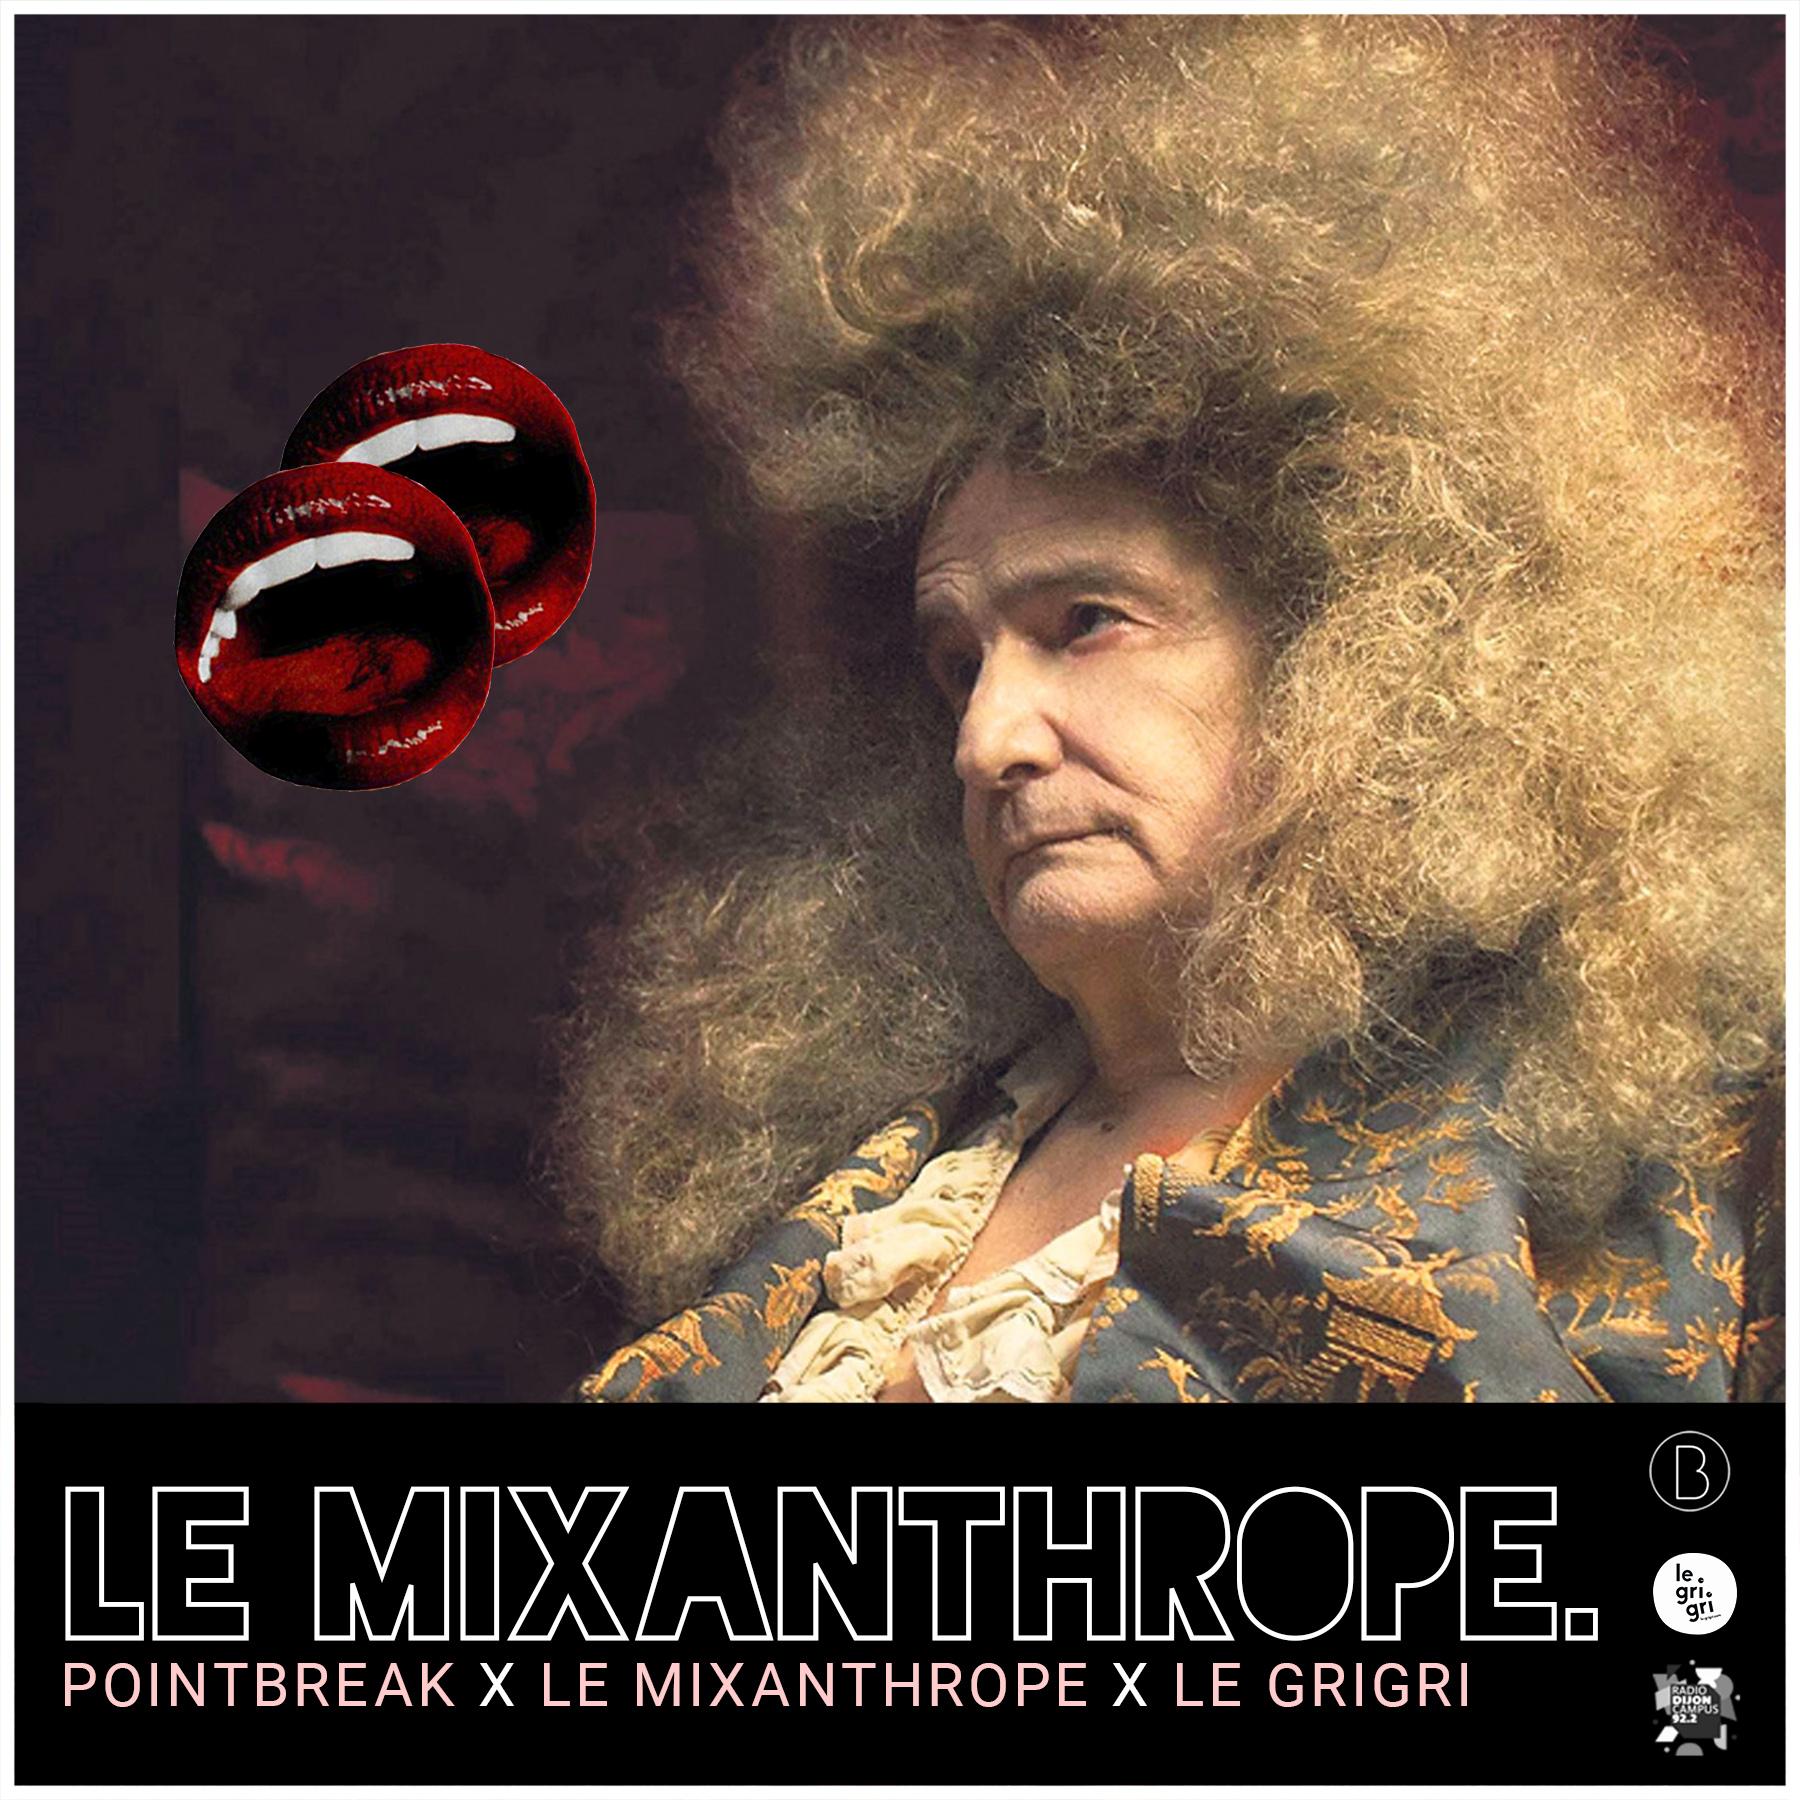 PointBreak Le Mixanthrope 2